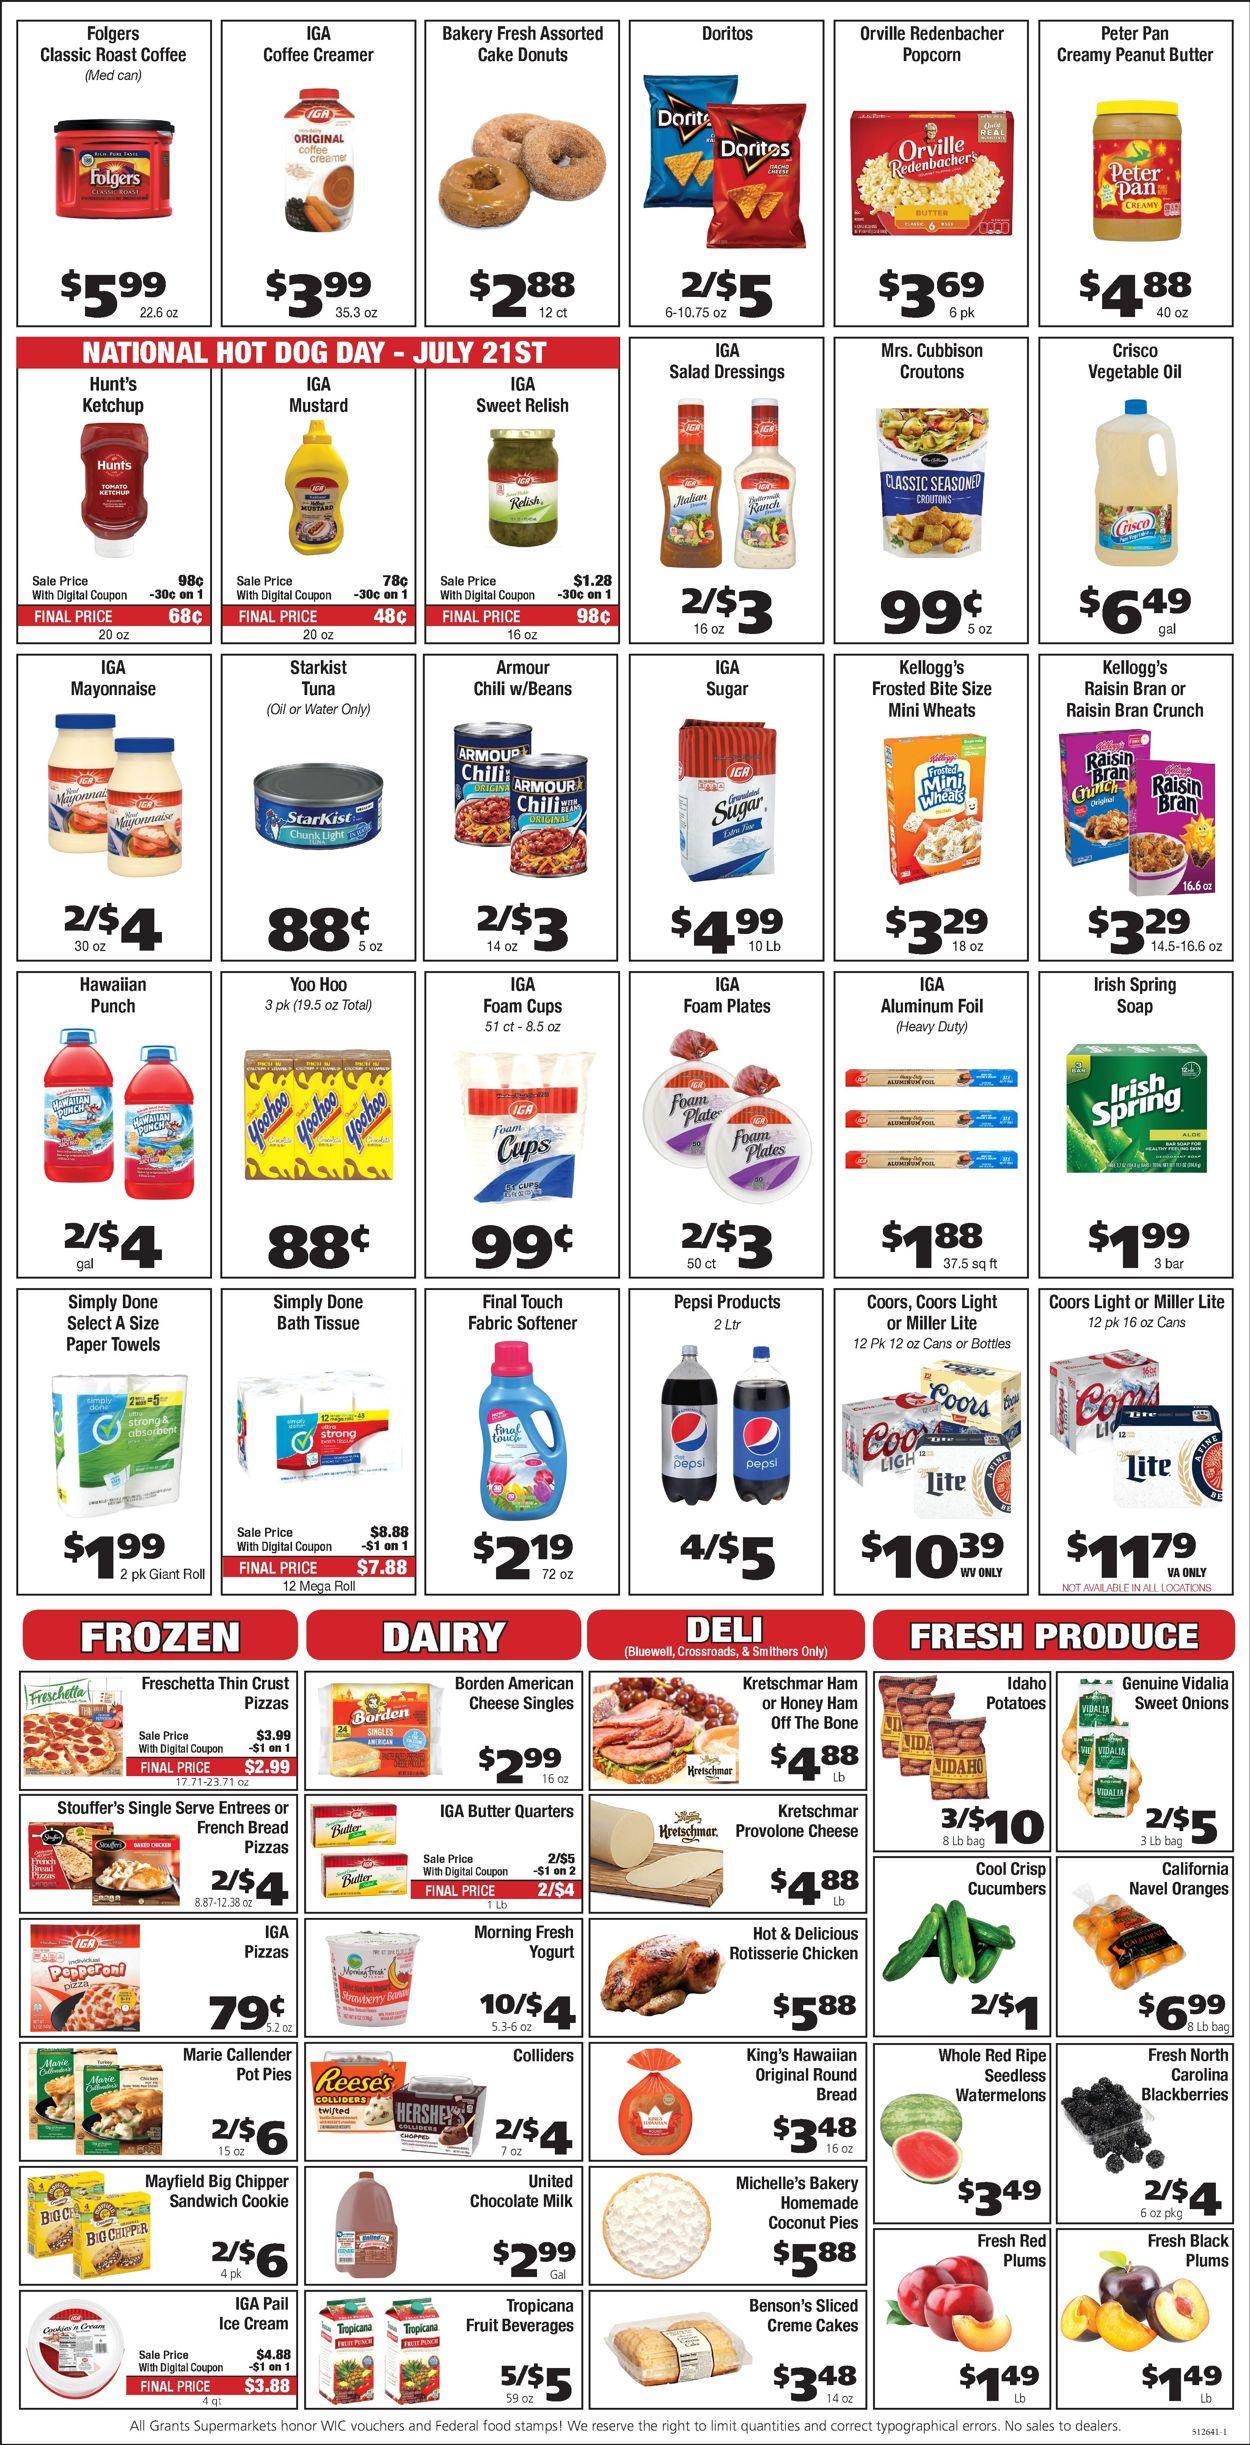 Grant's Supermarket Weekly Ad Circular - valid 07/21-07/27/2021 (Page 2)